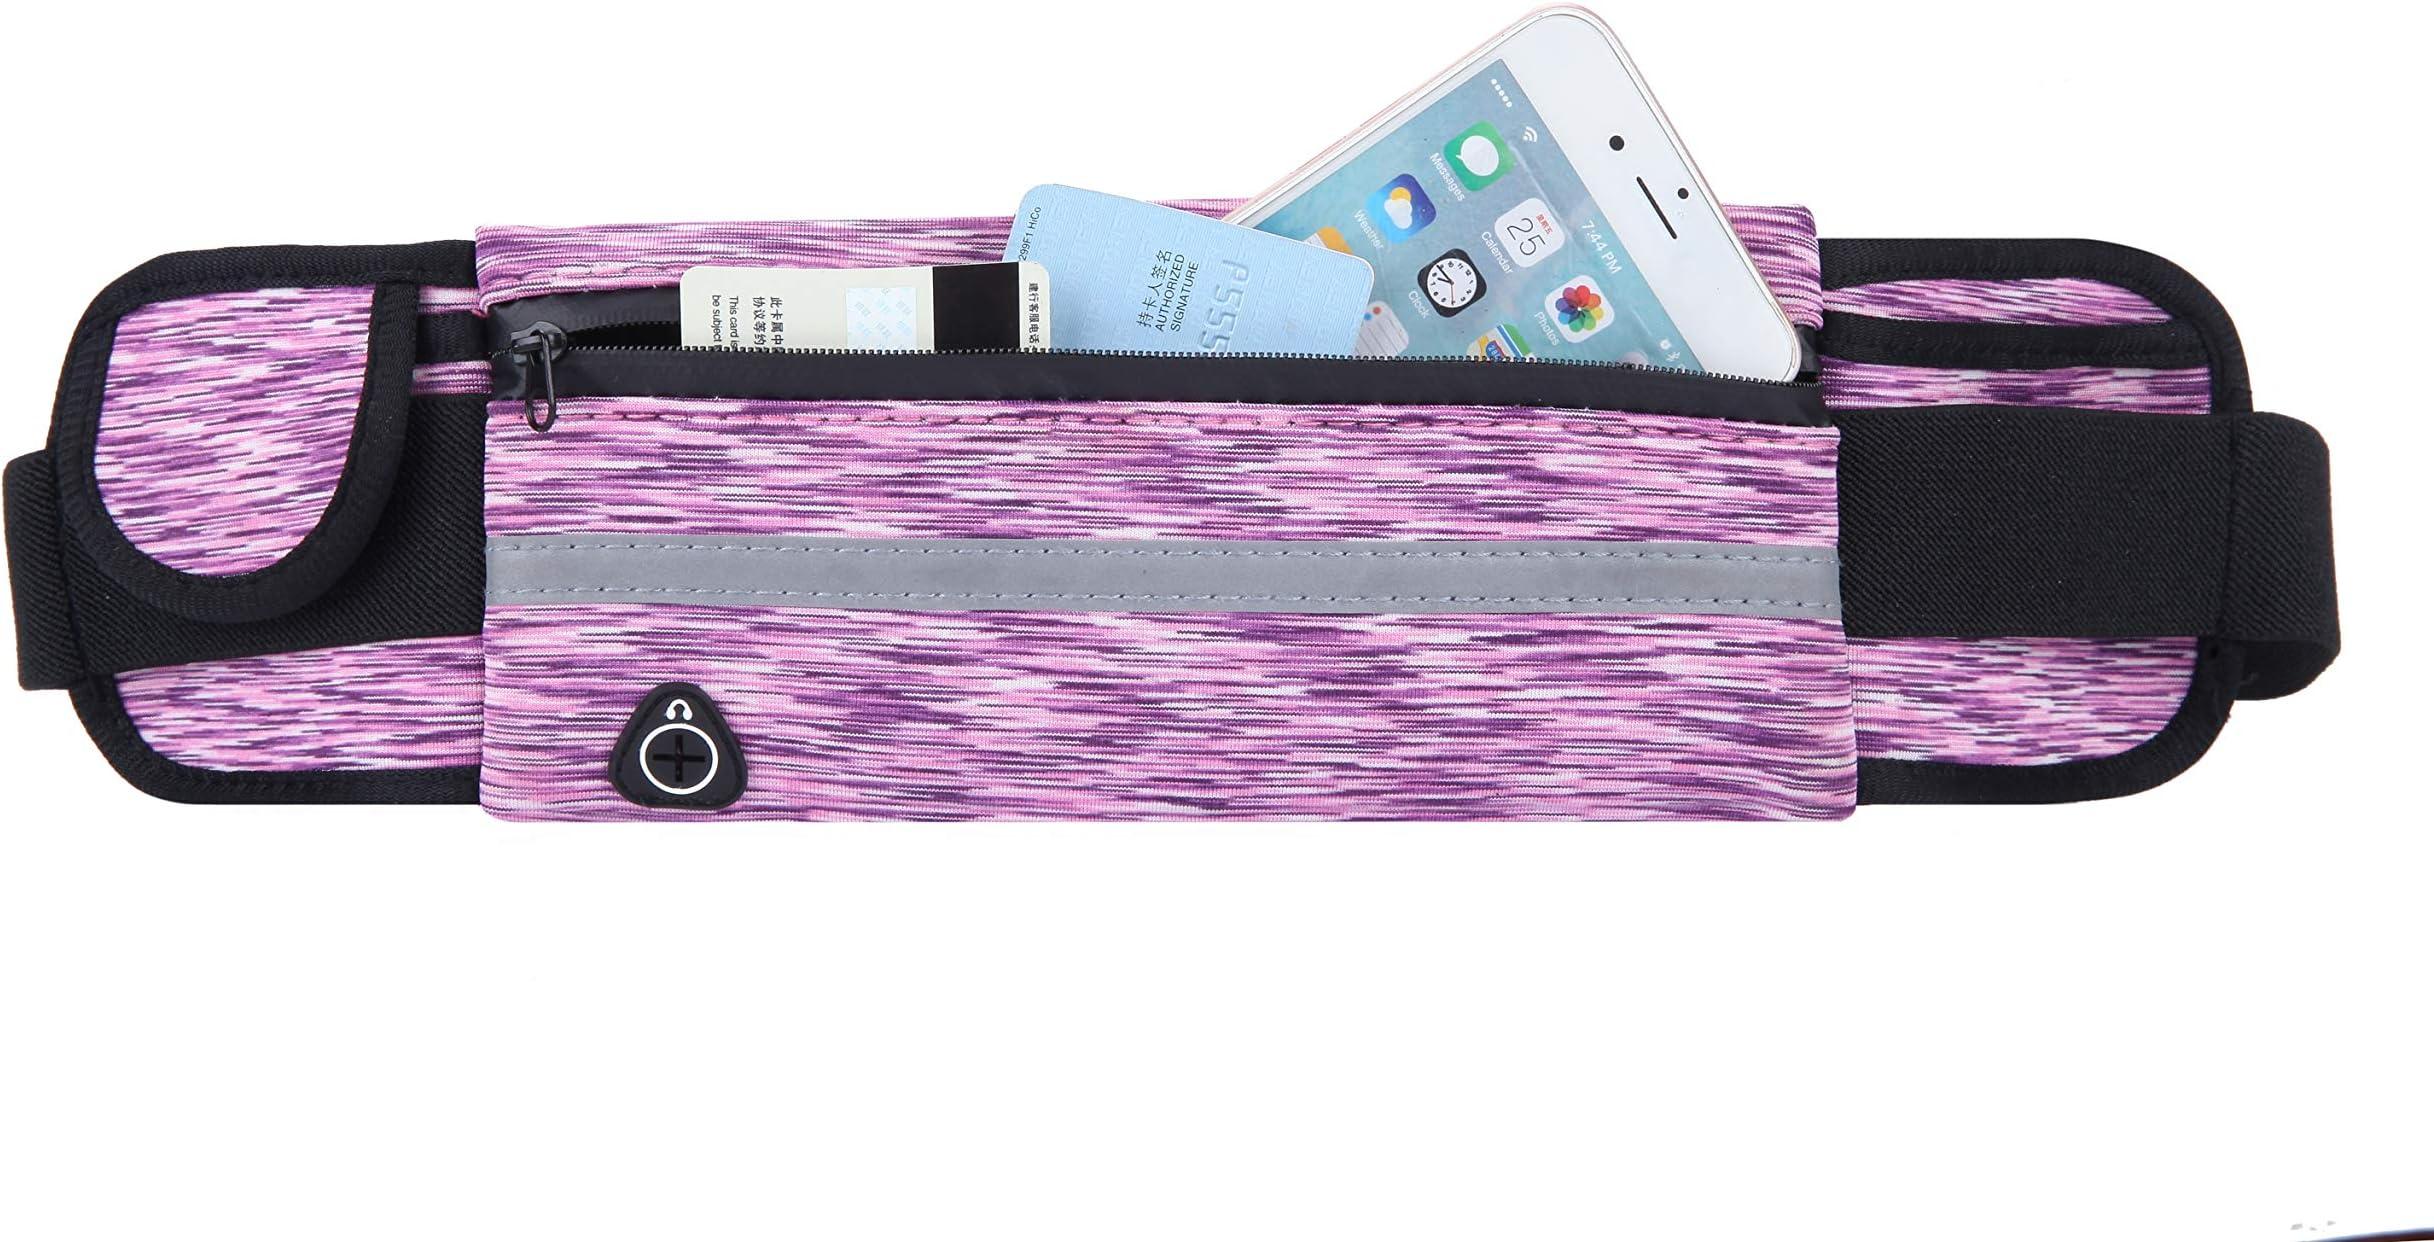 Details about  /Running Belt by Foot Forward Sports Jogging Hiking Walking-Waist Belt Pink